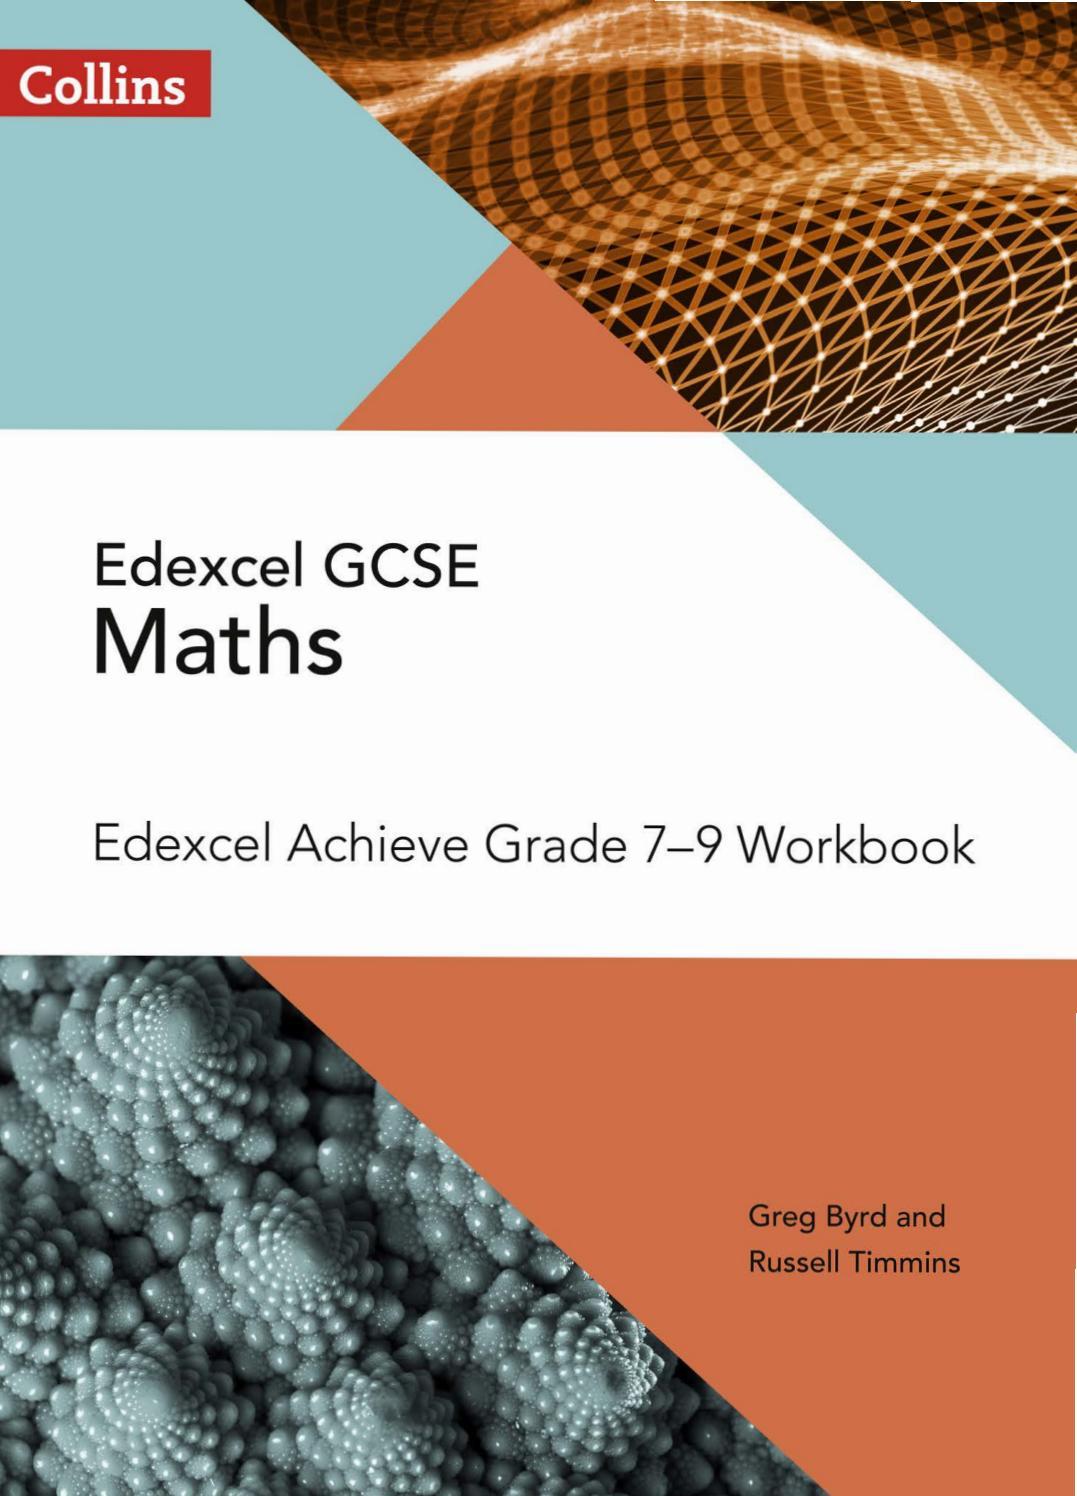 GCSE Maths Edexcel Achieve Grade 7-9 Workbook Sample Chapter by ...